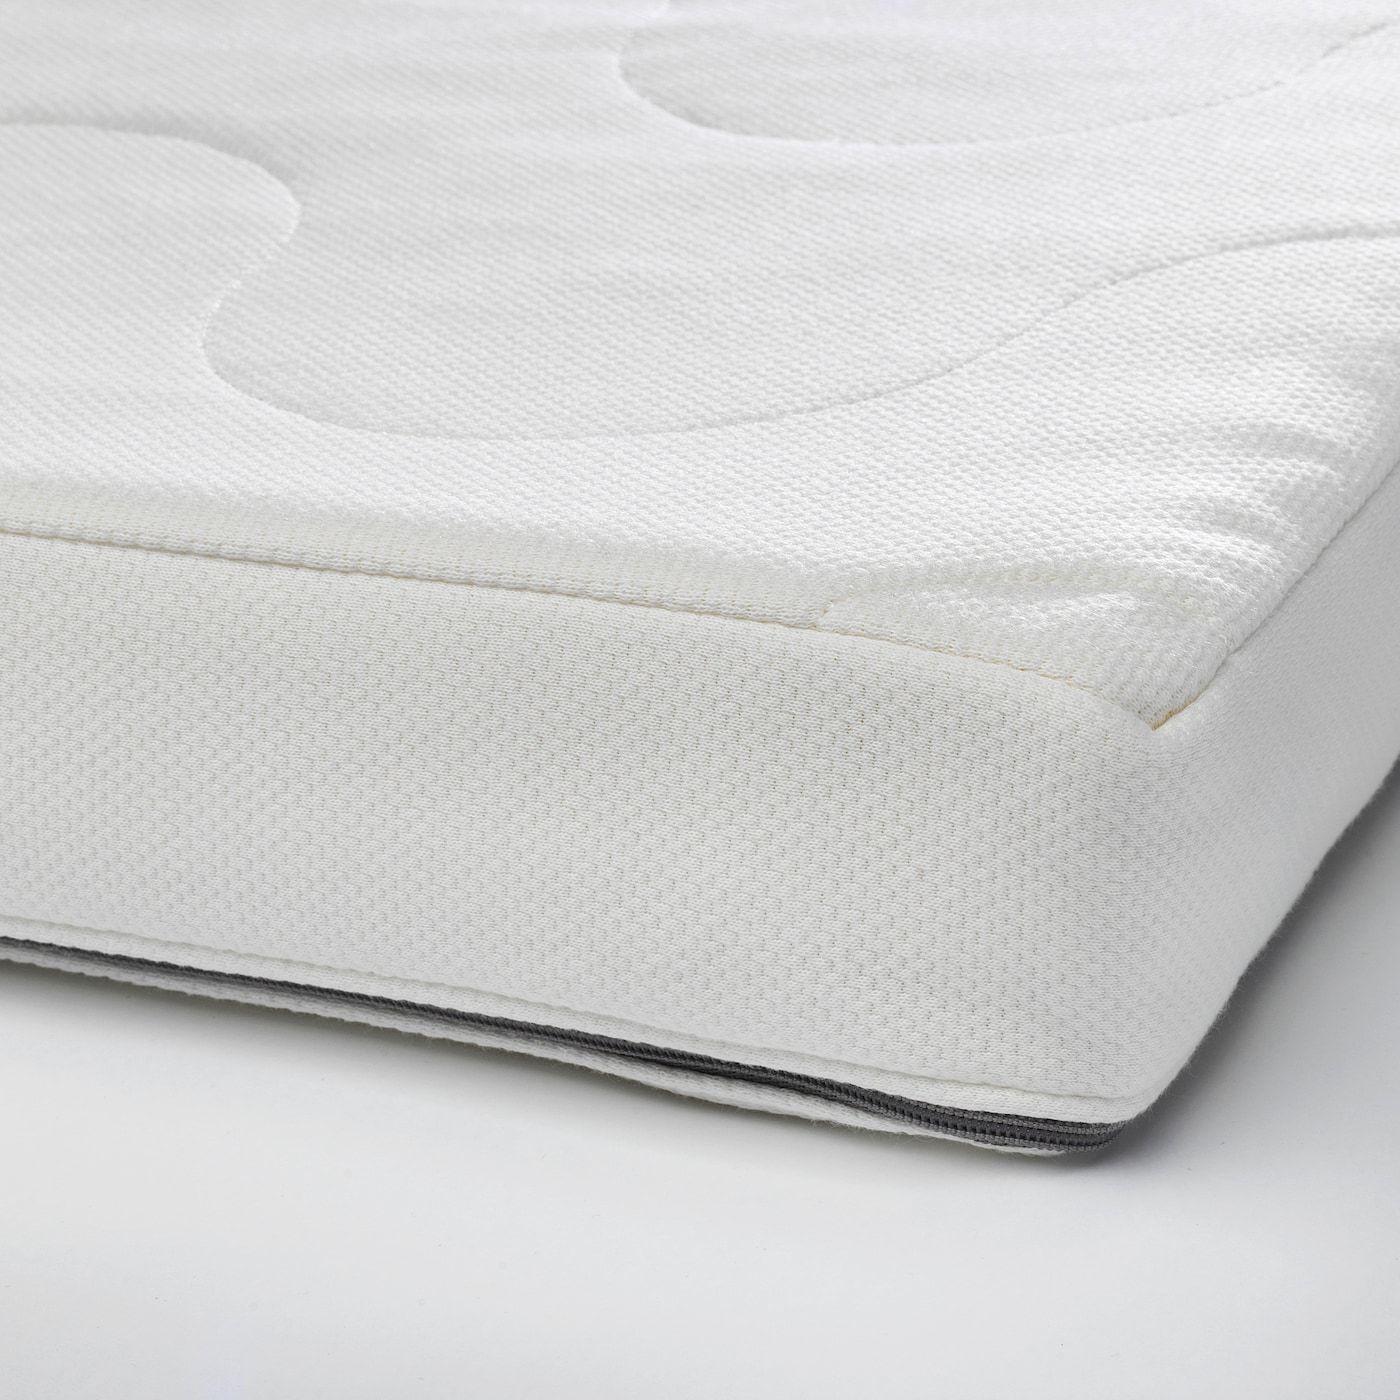 Krummelur Foam Mattress For Crib 27 1 2x52 Ikea In 2020 Mattress Ikea Crib Foam Mattress